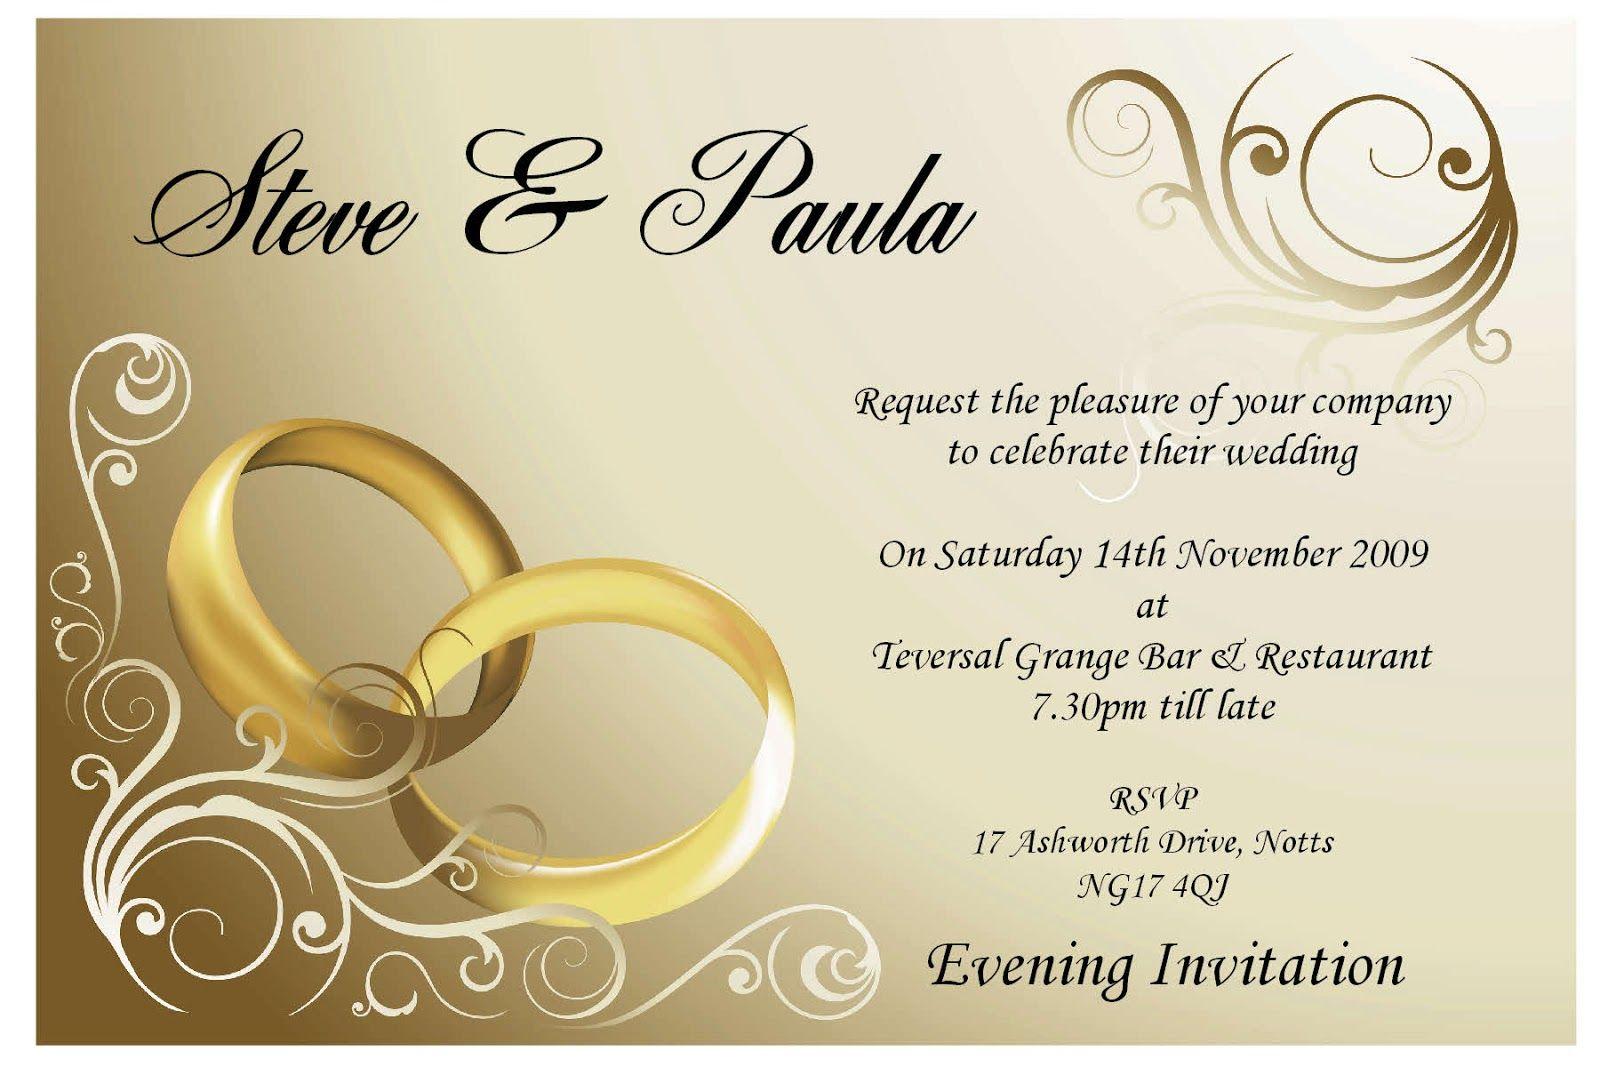 Wedding Invitation Designs in 2020 | Engagement invitation cards, Wedding  invitation card template, Marriage invitation card